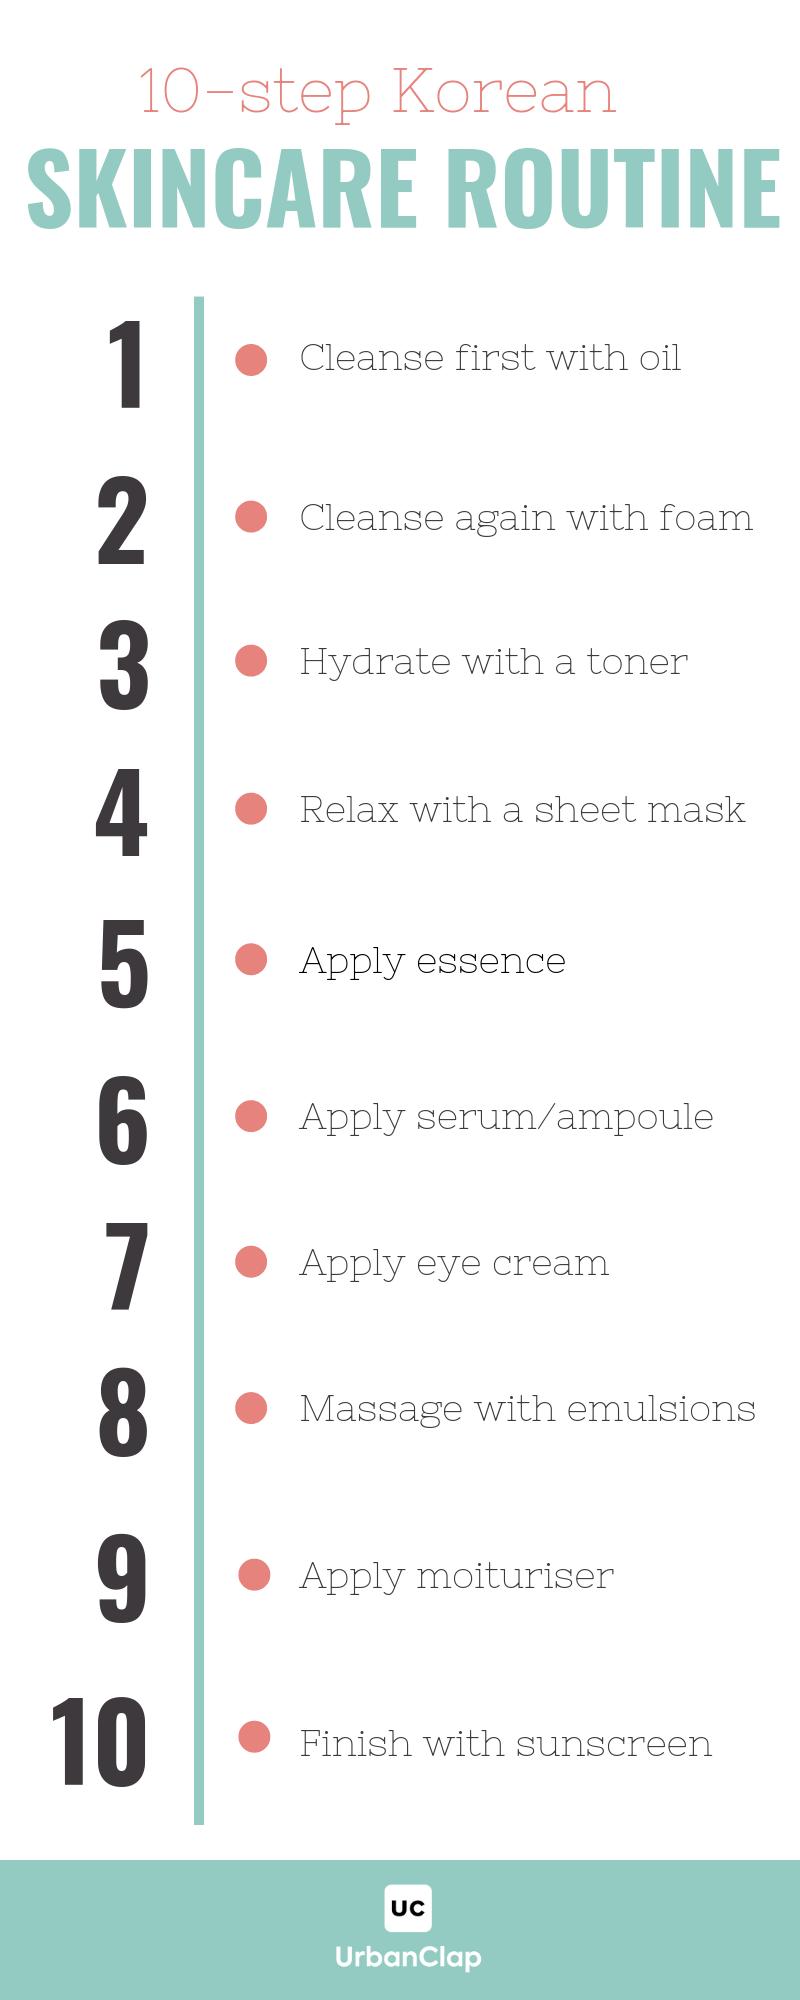 10 Step Korean Skin Care Routine Korean Skincare Routine Korean 10 Step Skin Care Korean Skincare